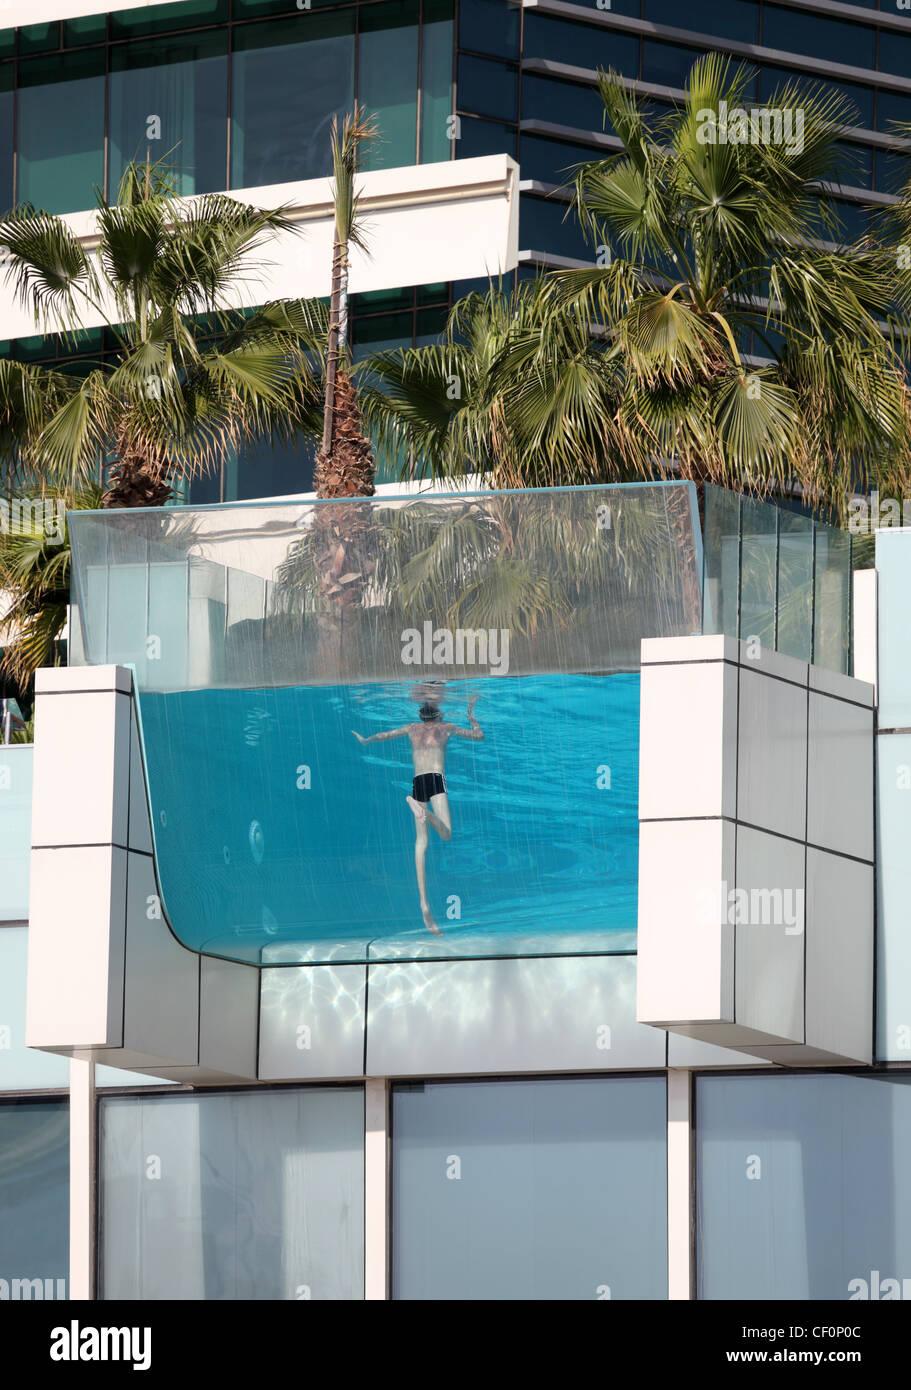 Swimming pool dubai stock photos swimming pool dubai - Dubai airport swimming pool price ...